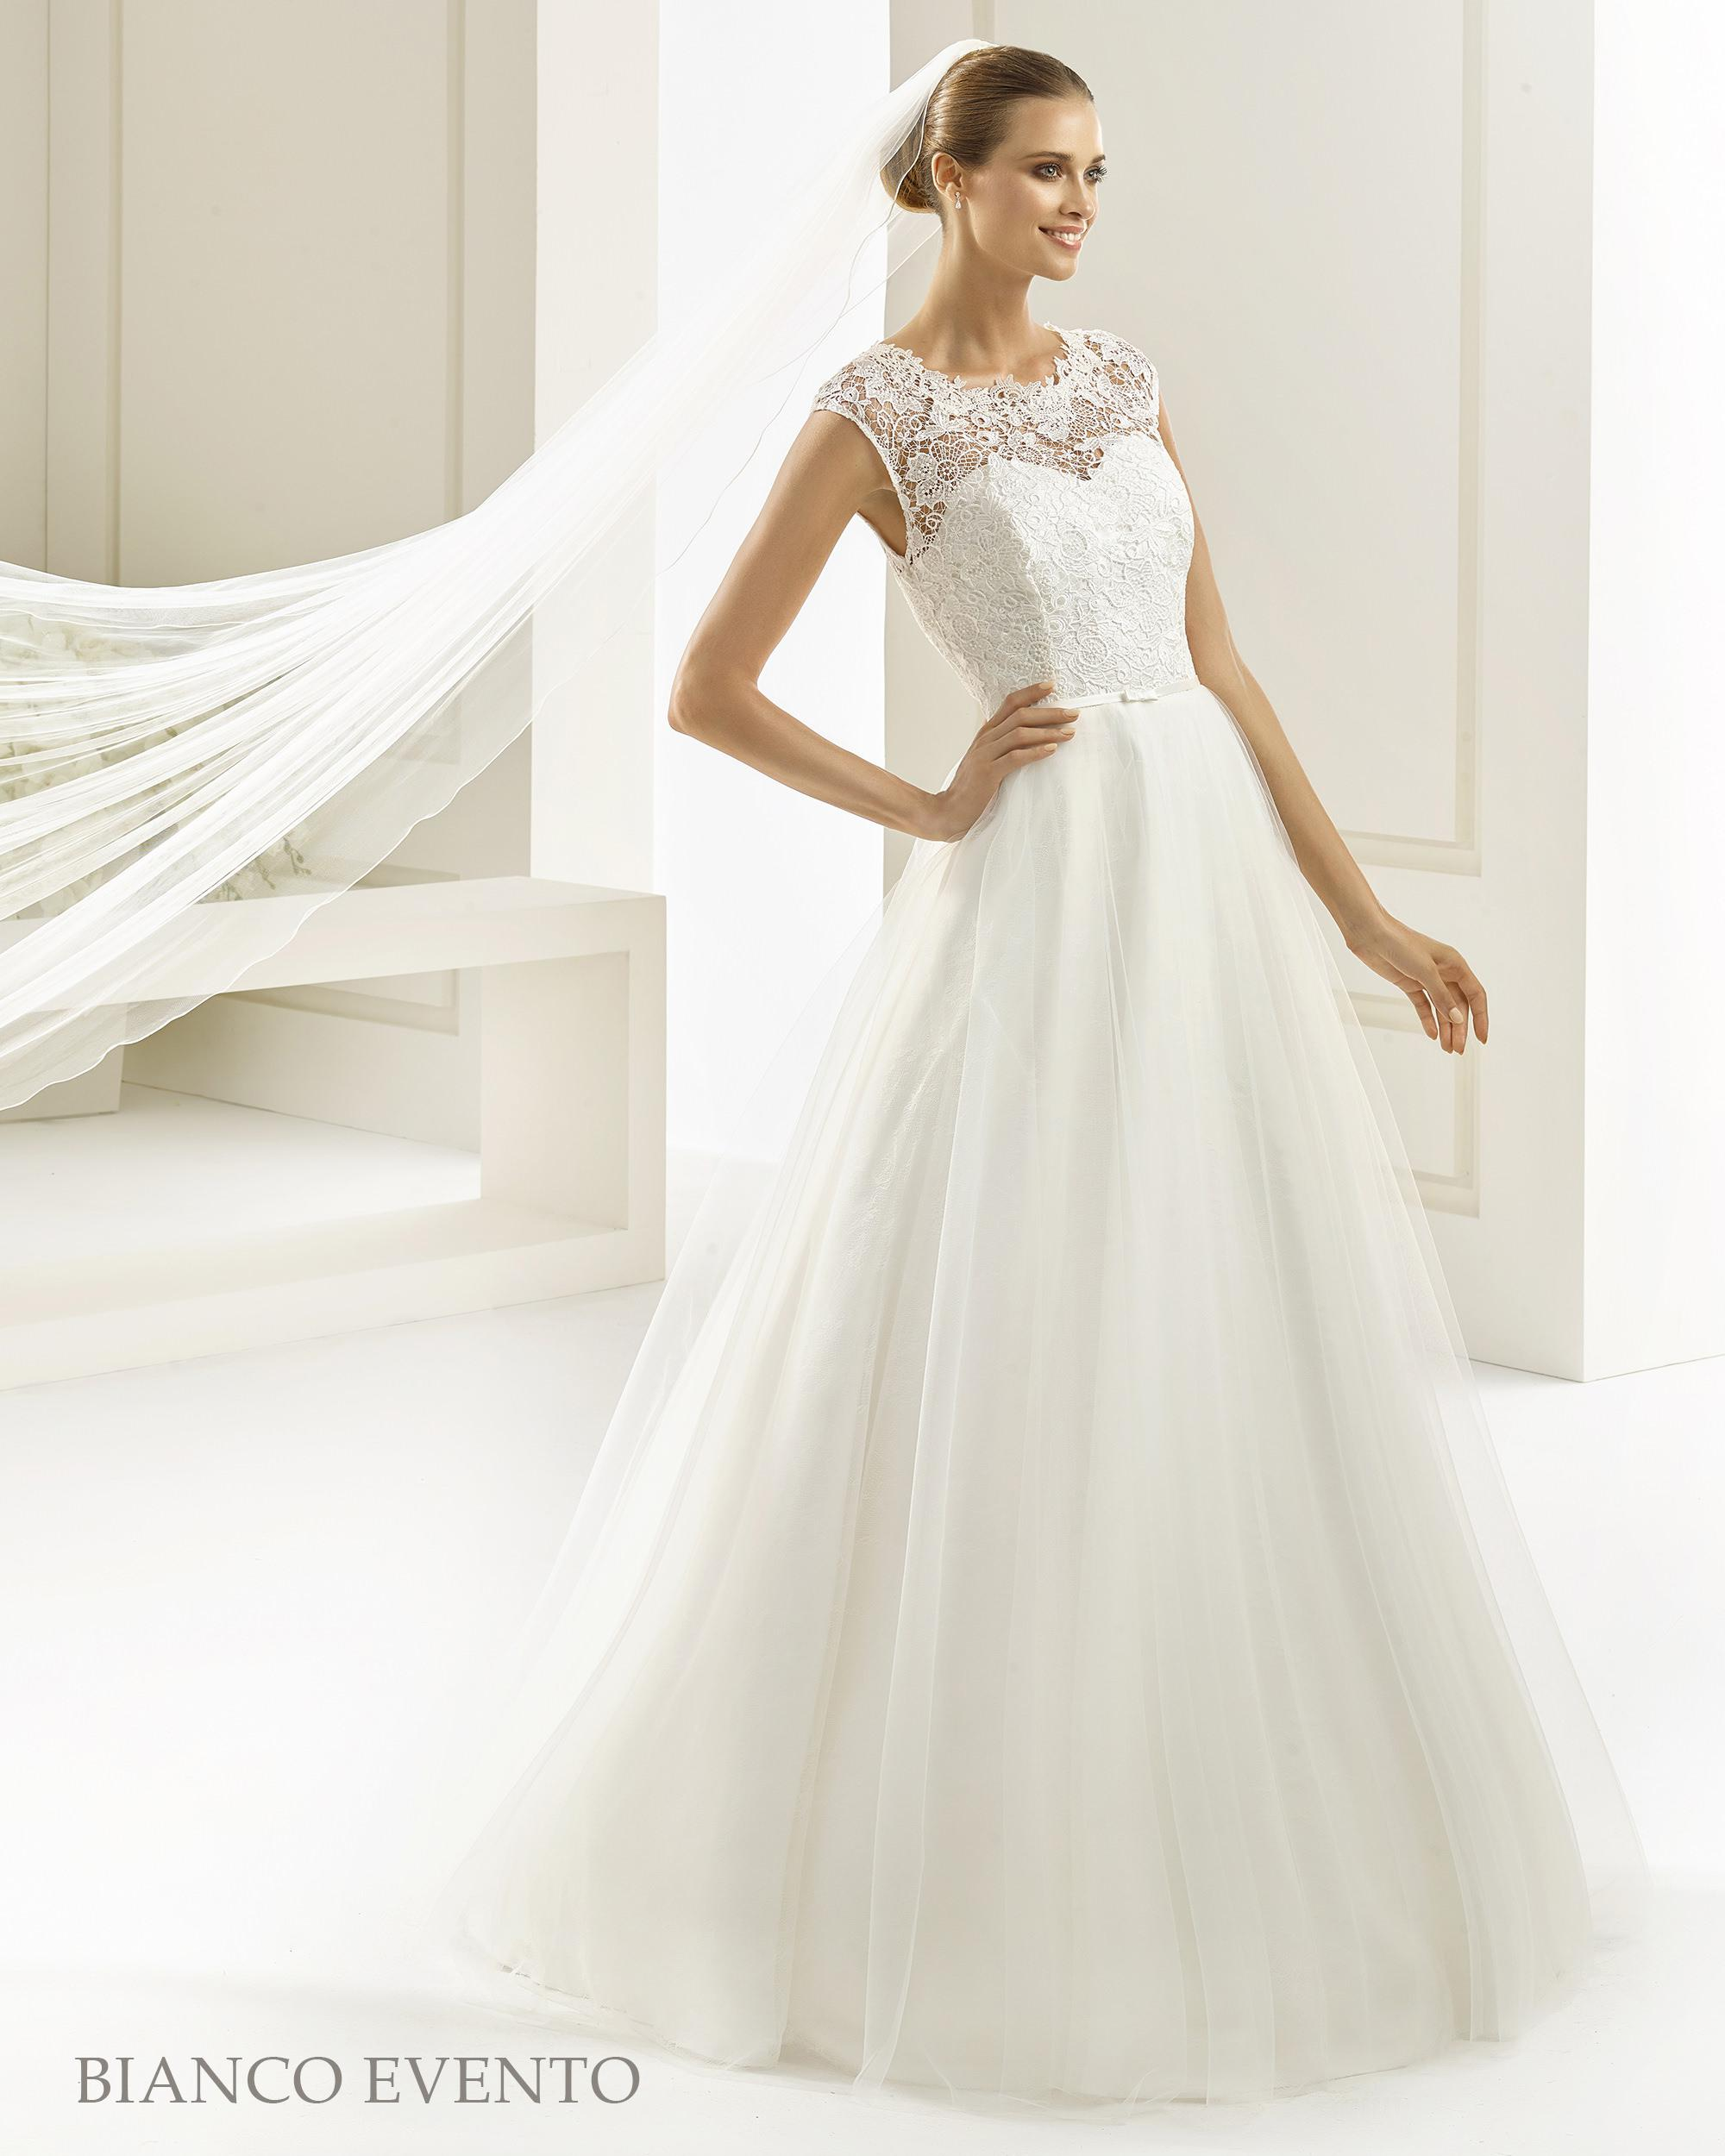 Bianco Evento - Annabel, Ivory:38